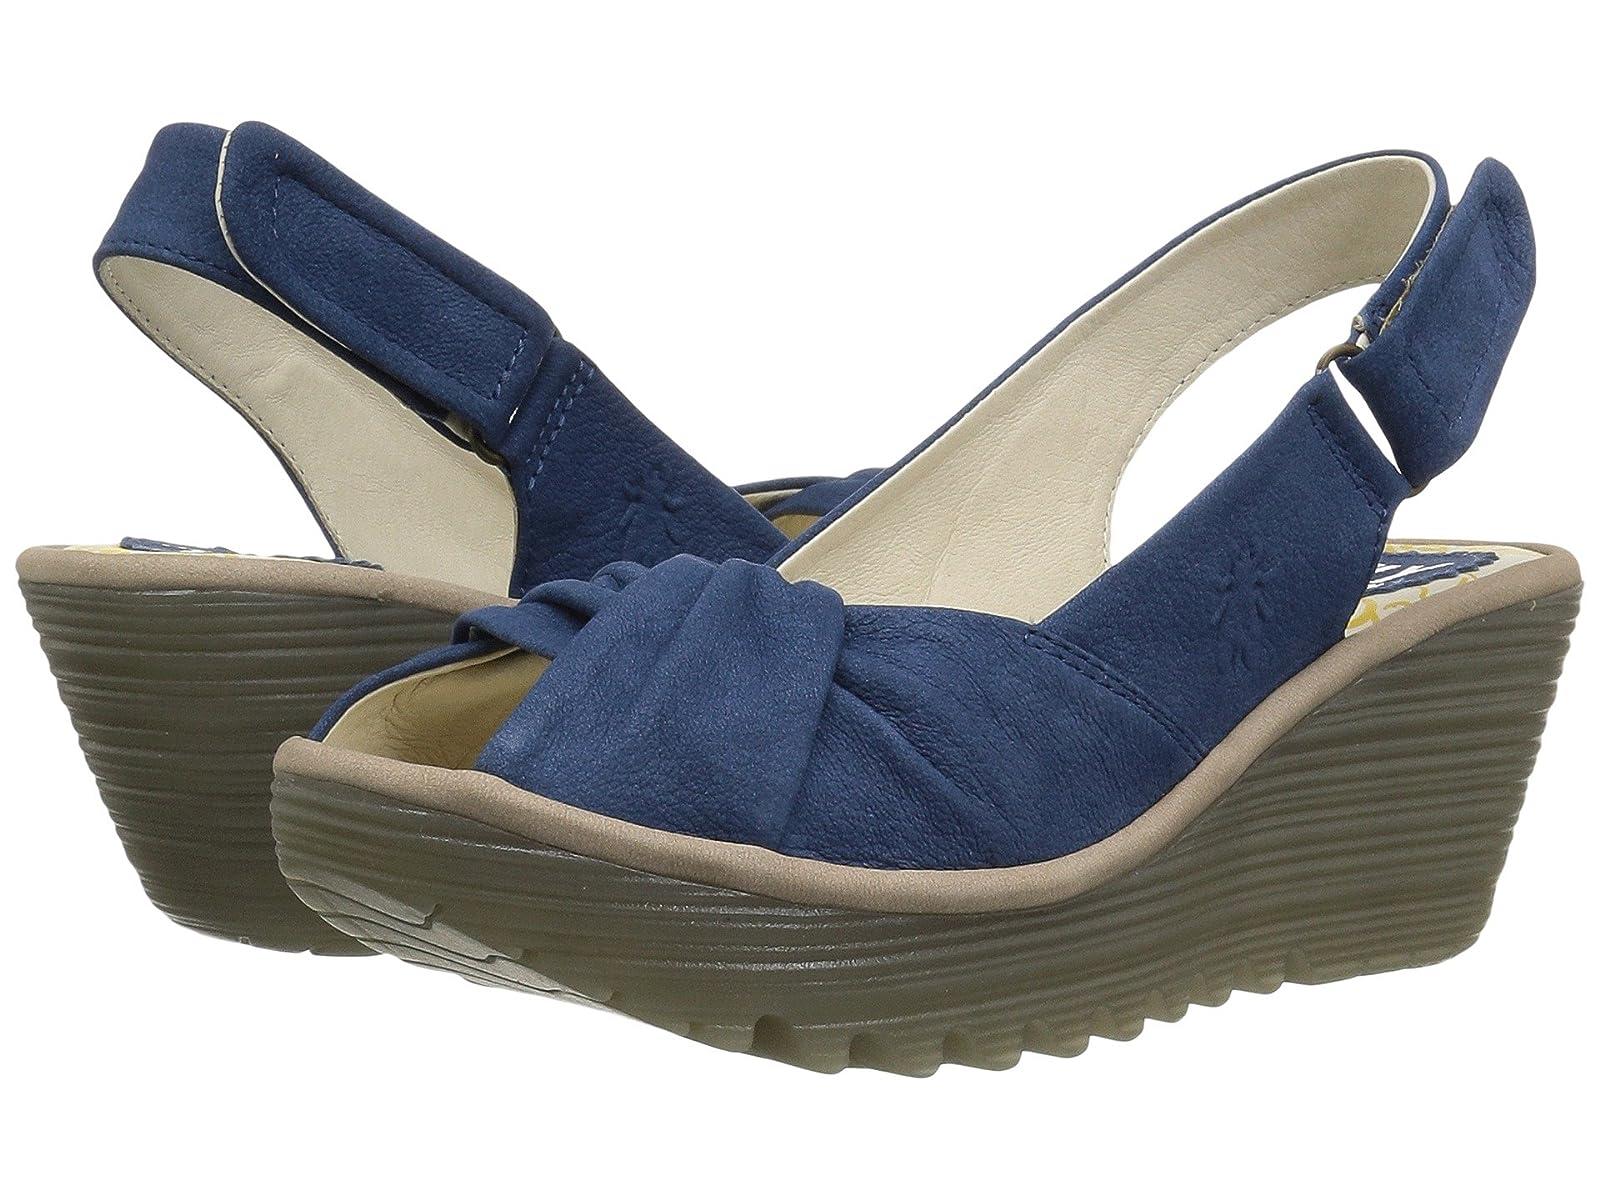 FLY LONDON YATA820FLYAtmospheric grades have affordable shoes